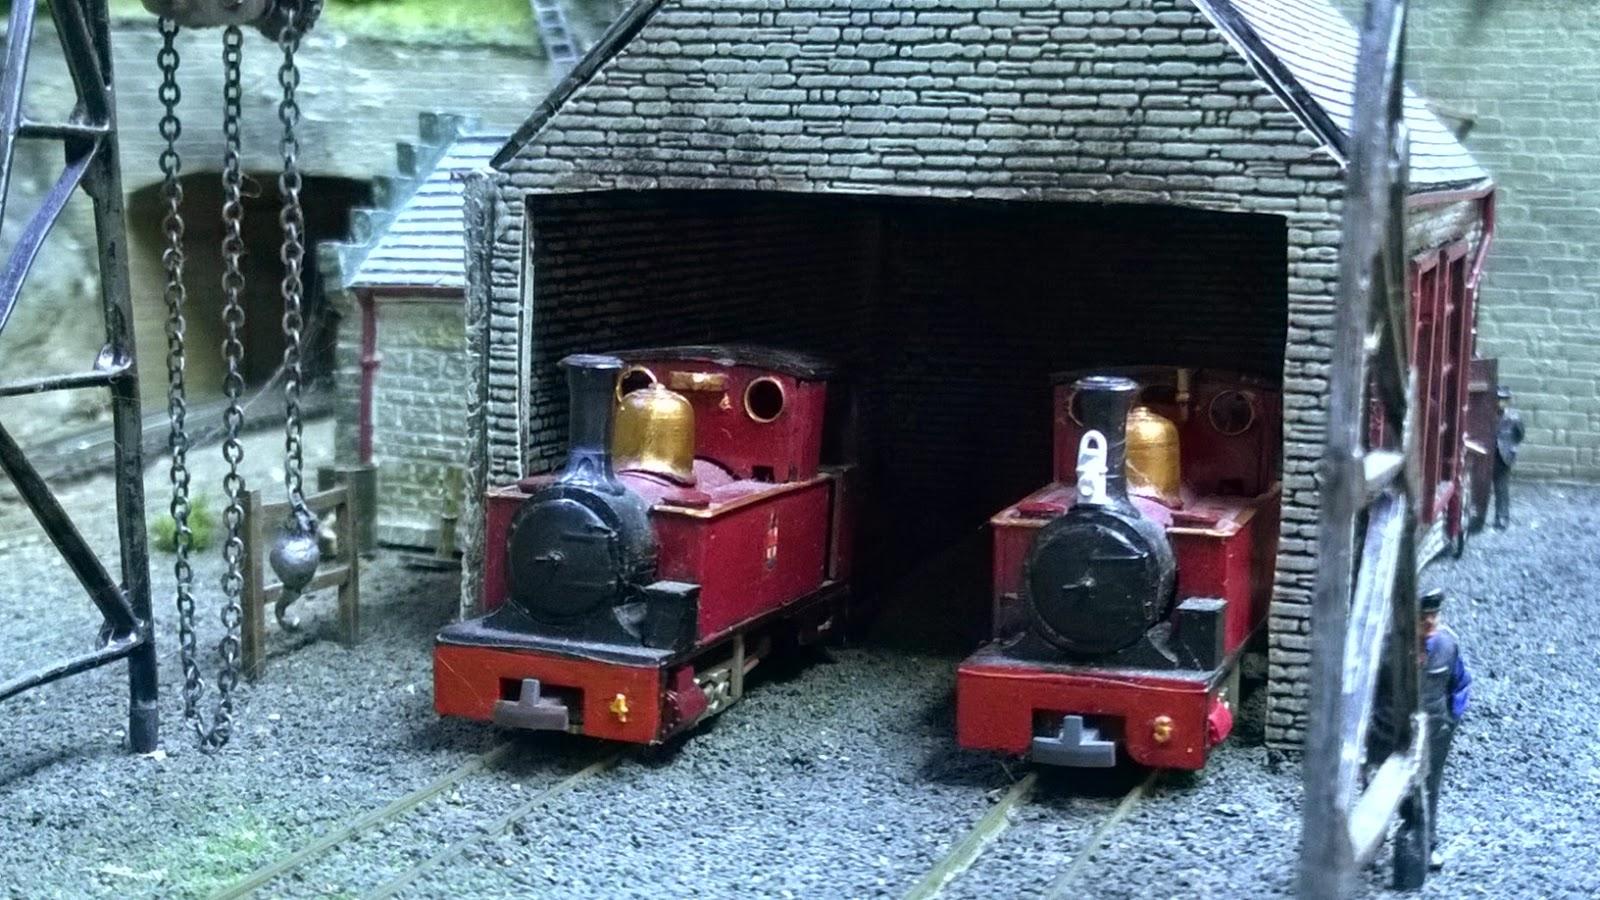 009 oo9 gem vari-kit loco engine